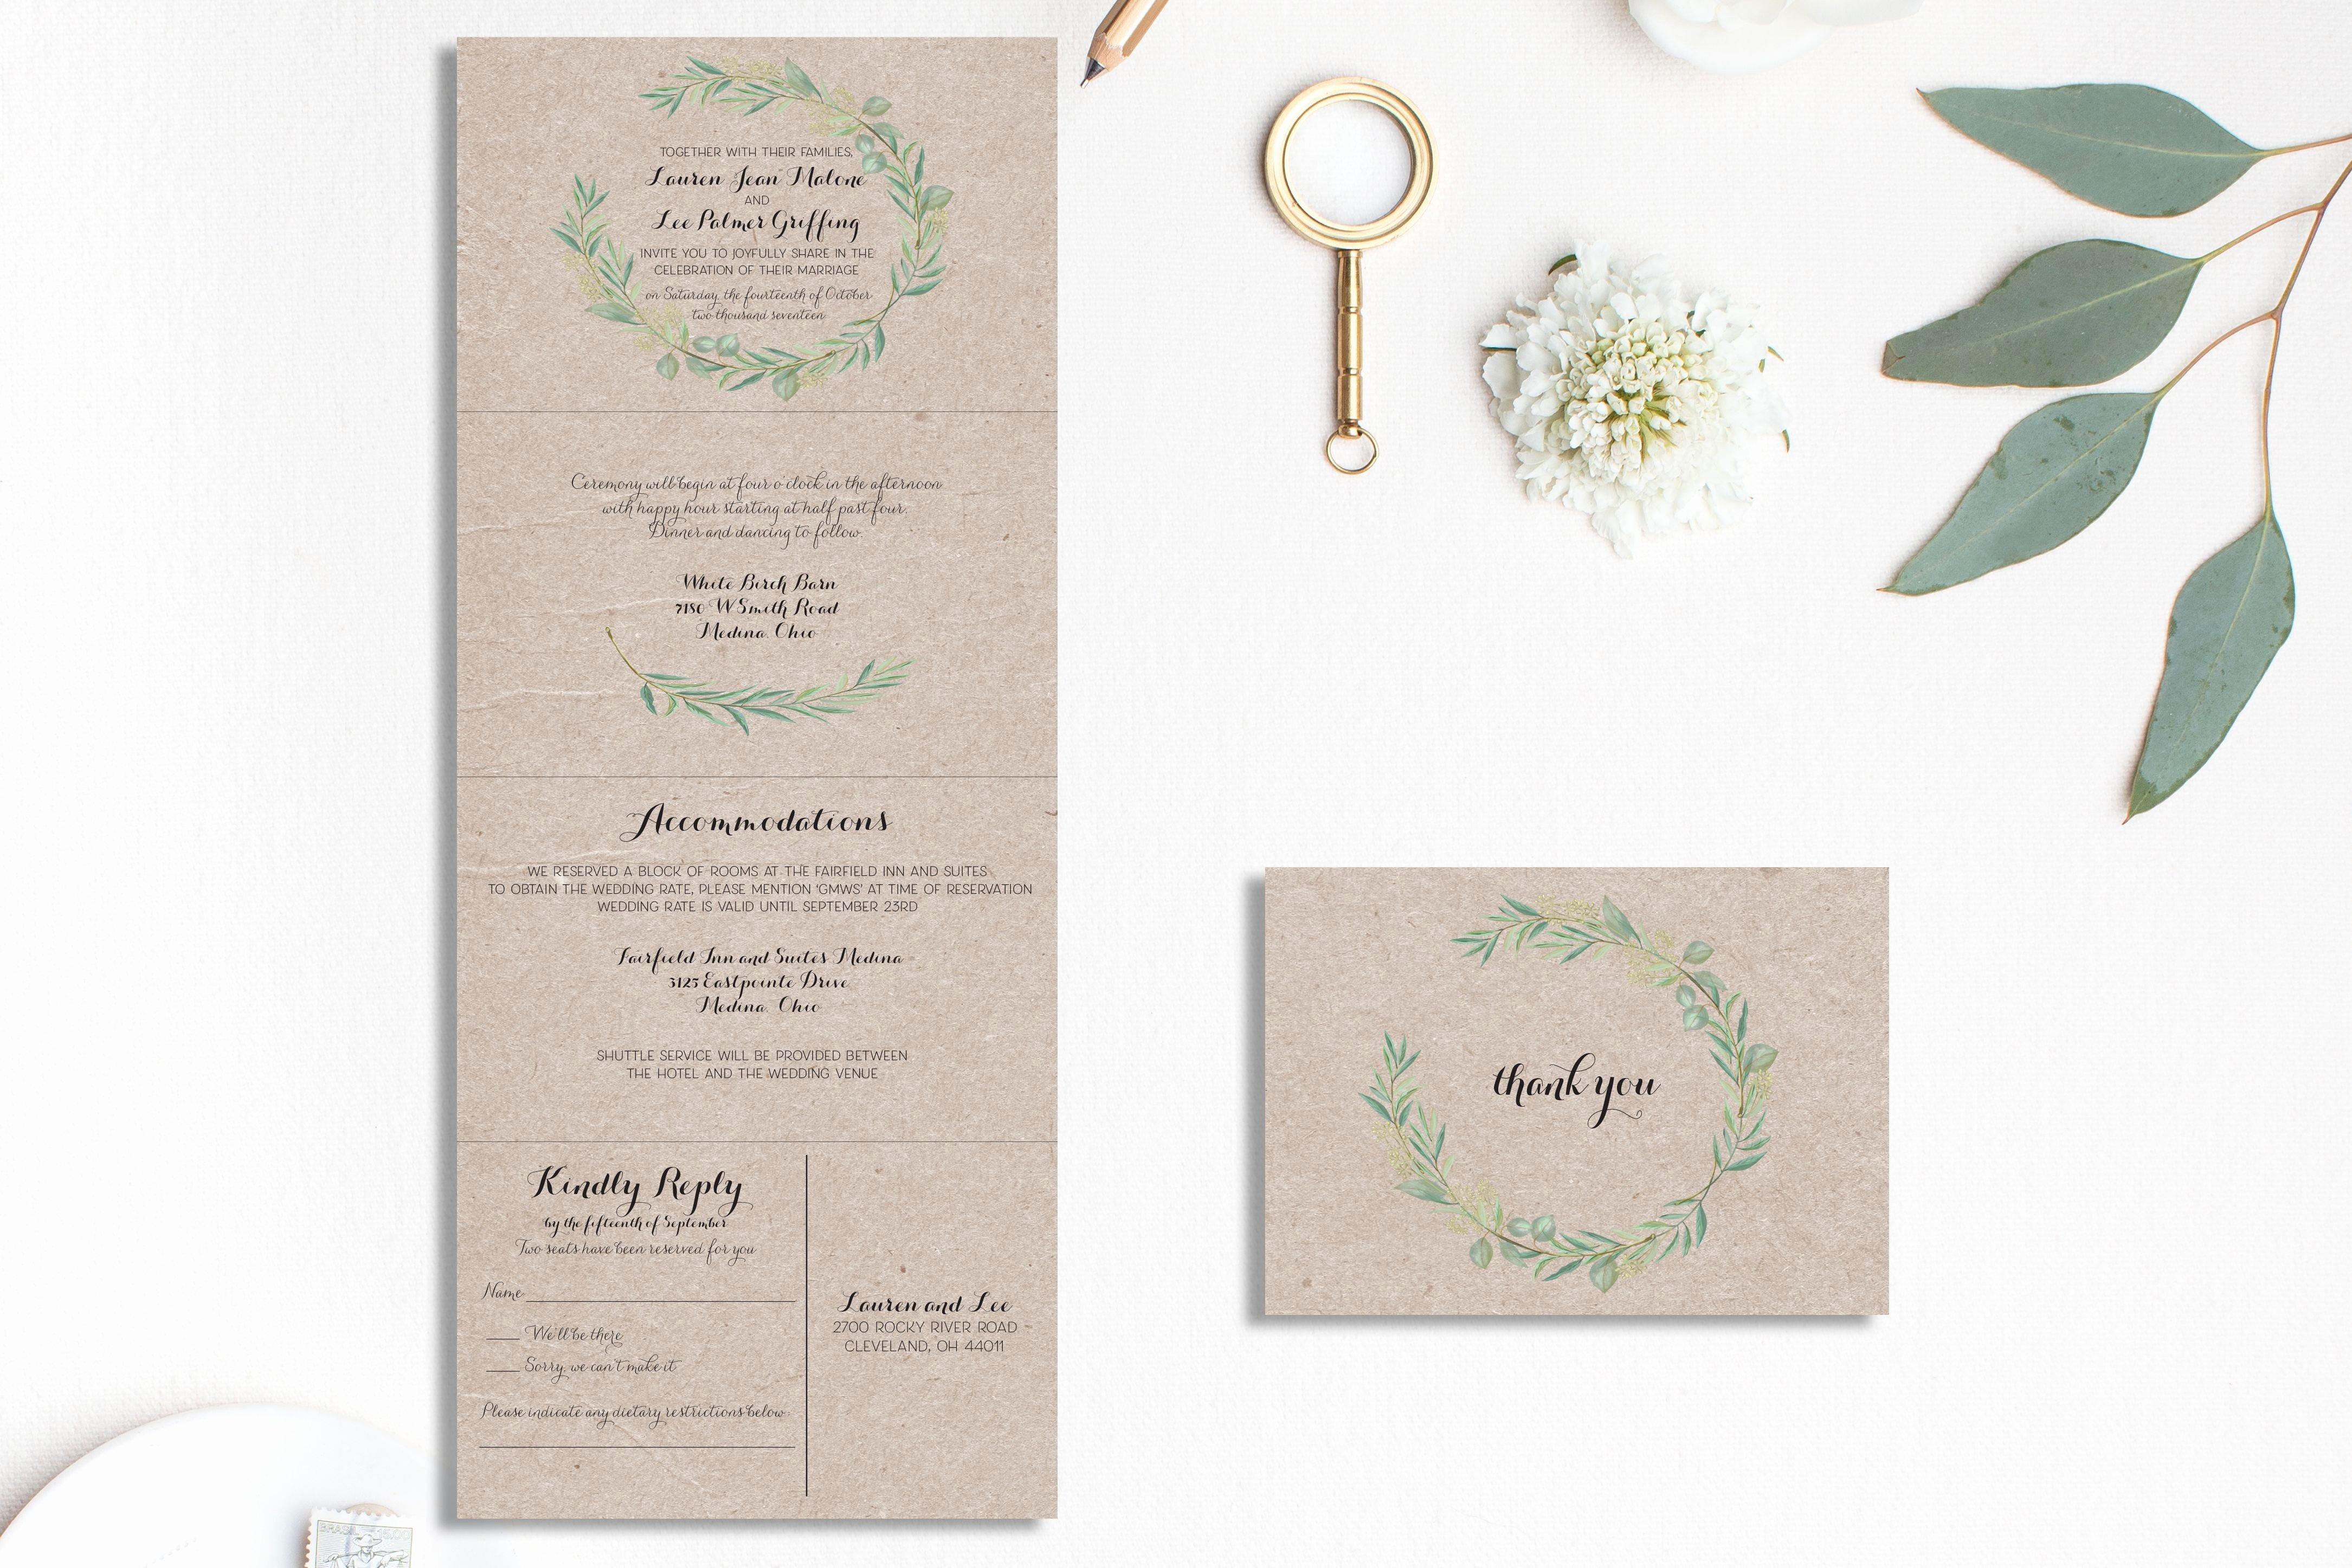 tri fold wedding invitations template sample pdf peonies cut wedding invitation 5x7 gate fold card template